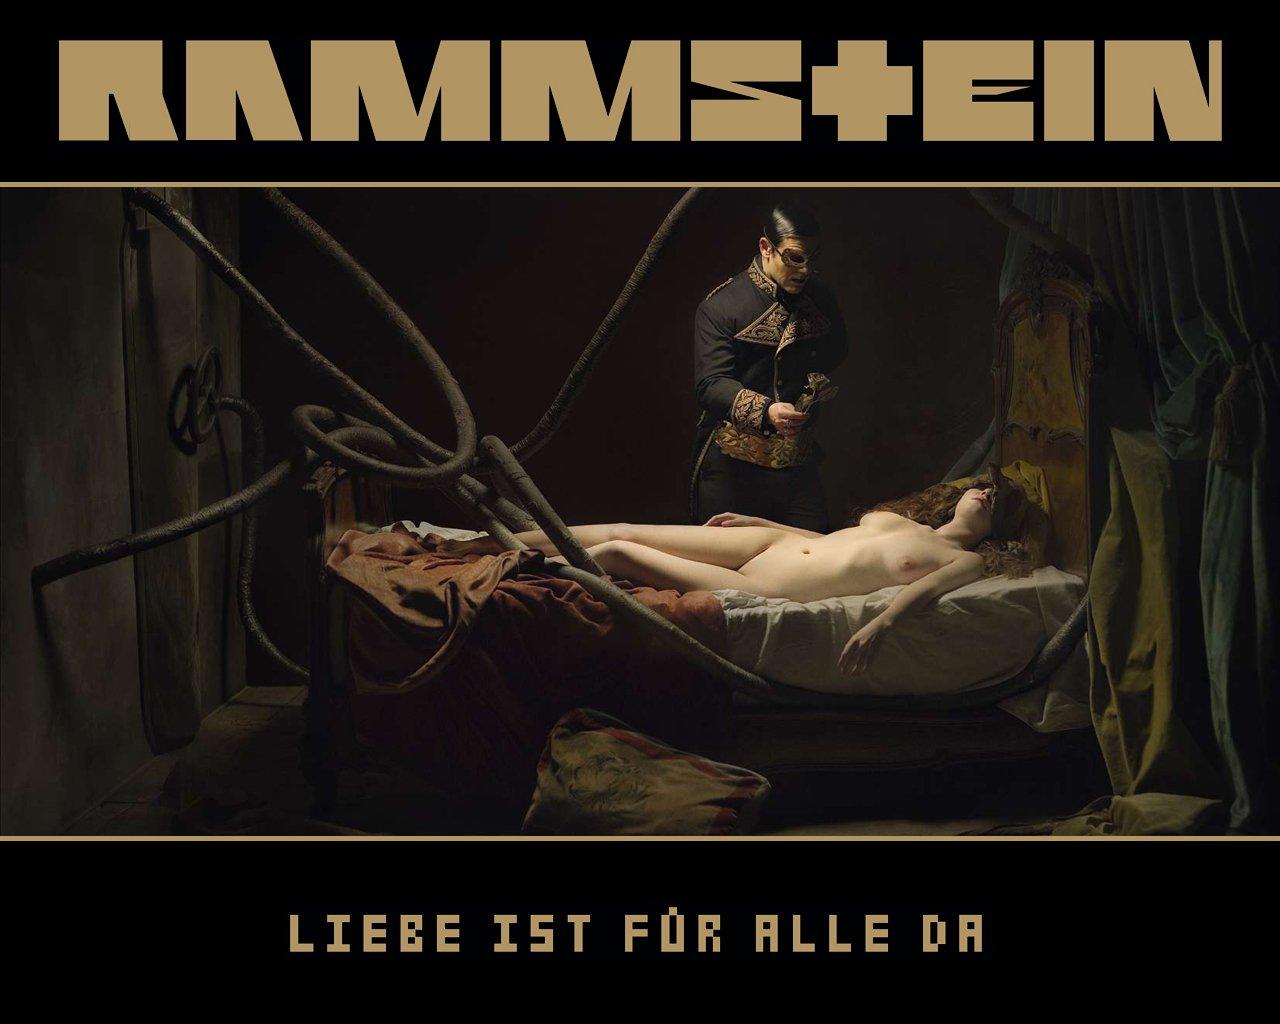 Wallpaper Collections Rammstein